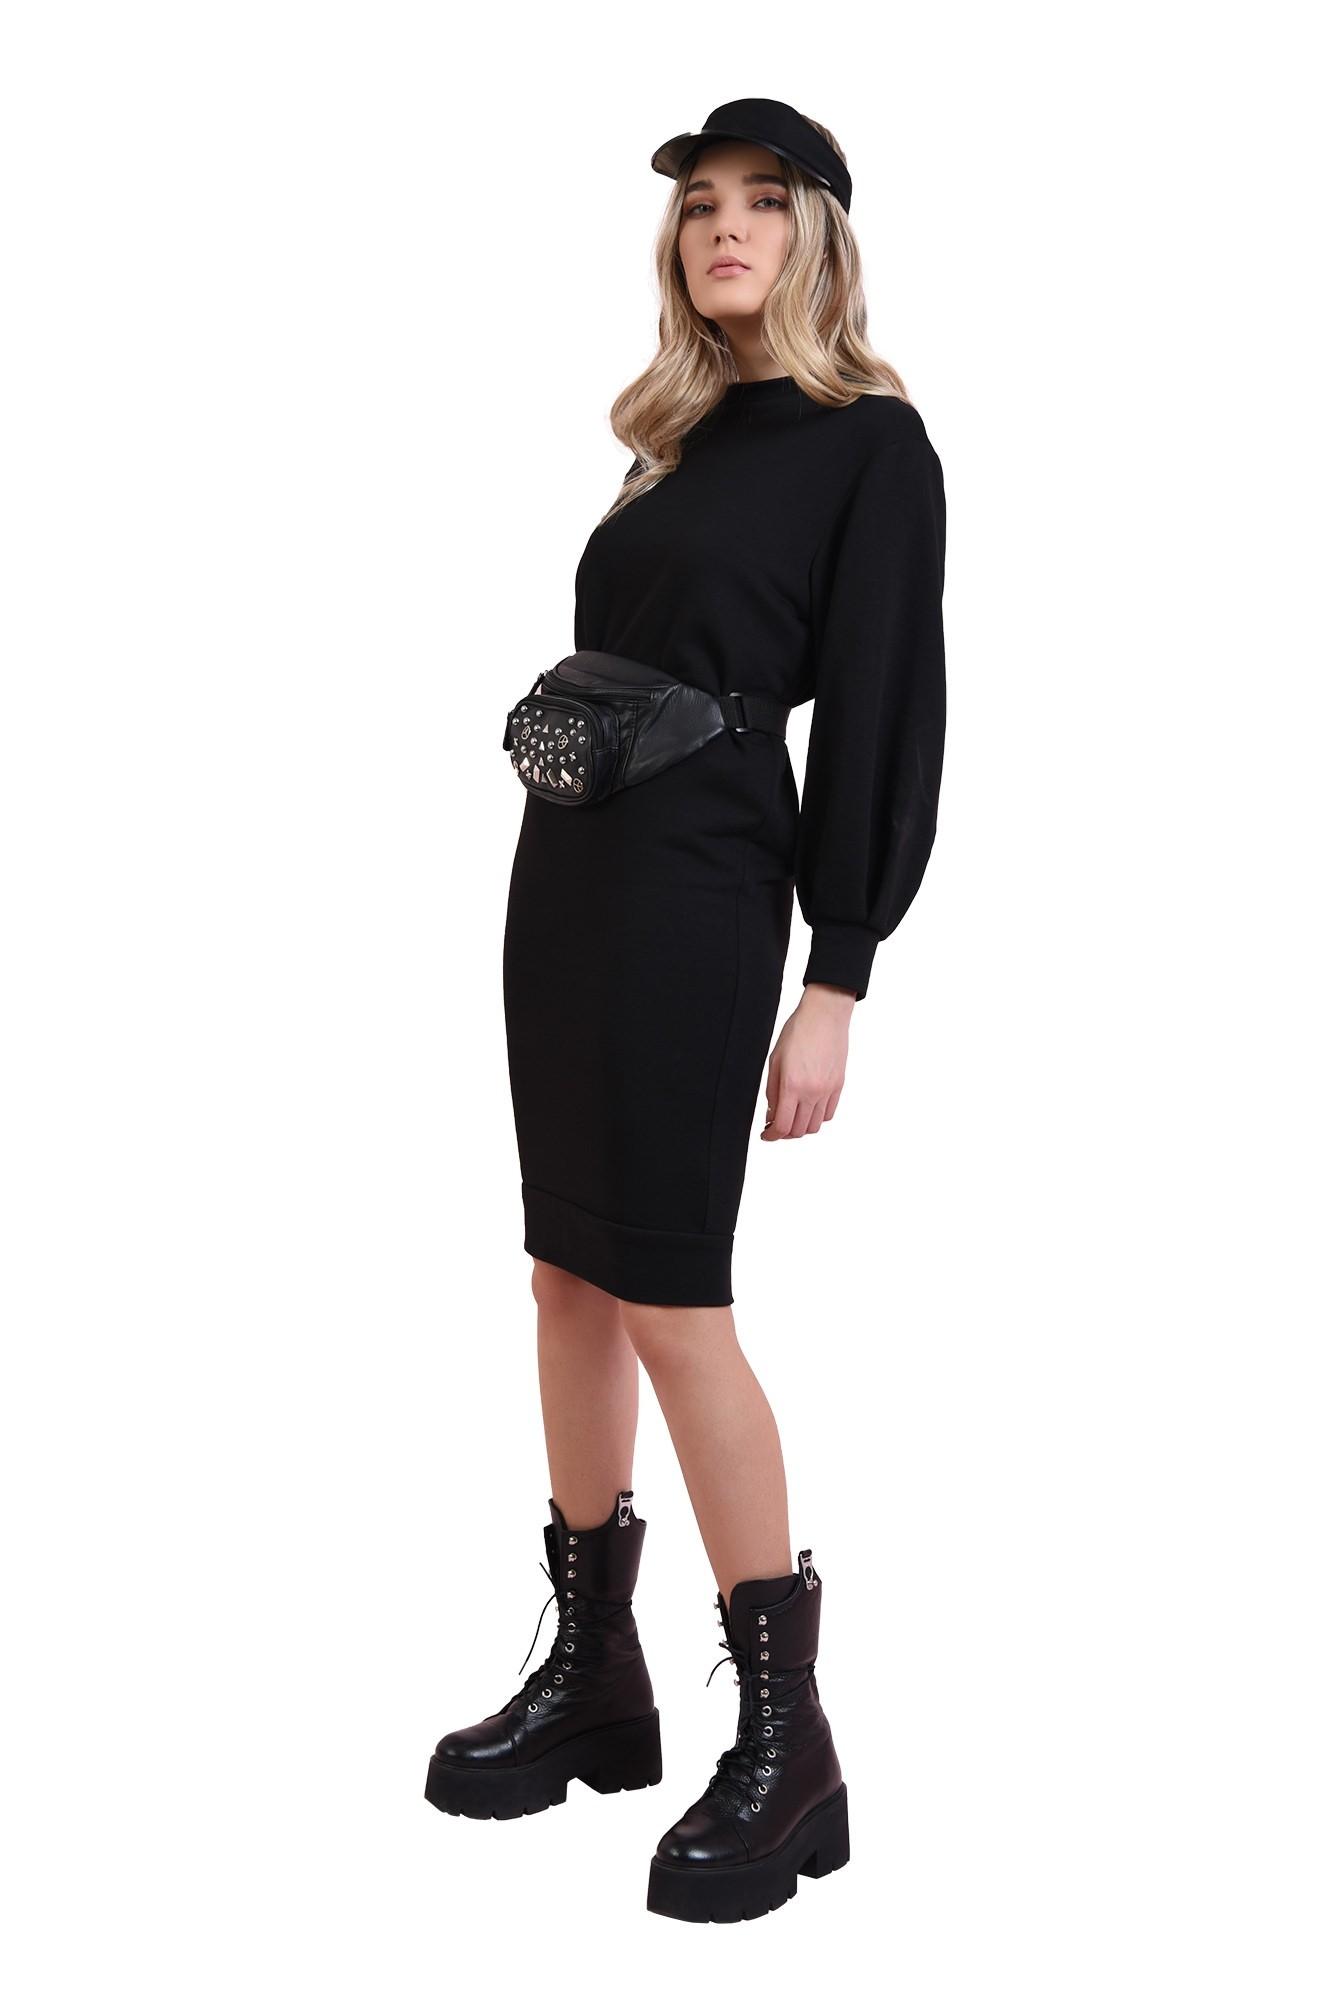 3 - rochie casual, neagra, cu maneca bufanta